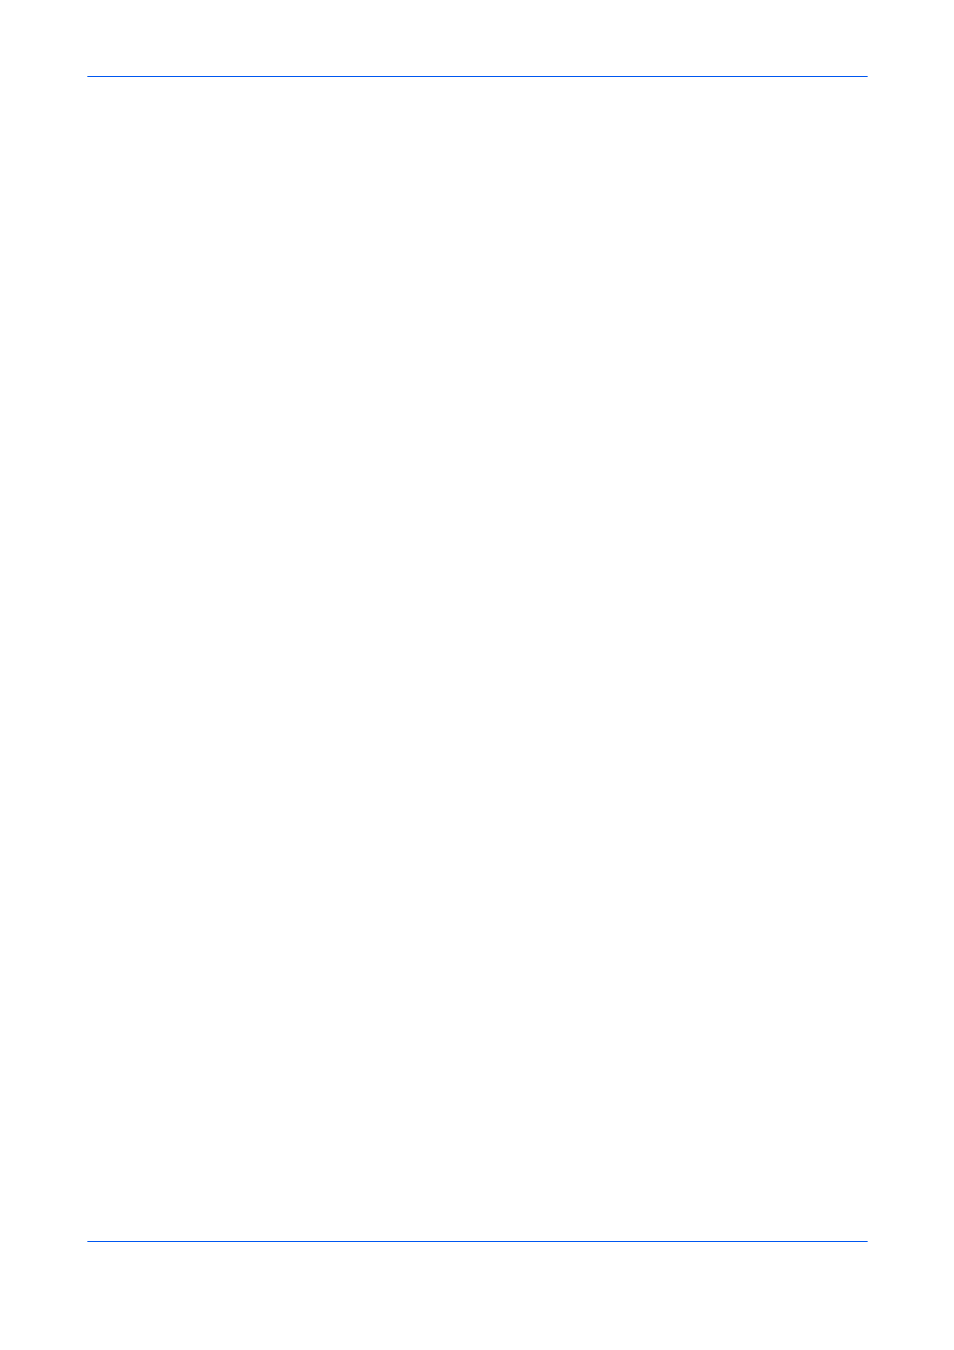 Emf spooling | Kyocera FS-820 User Manual | Page 92 / 105